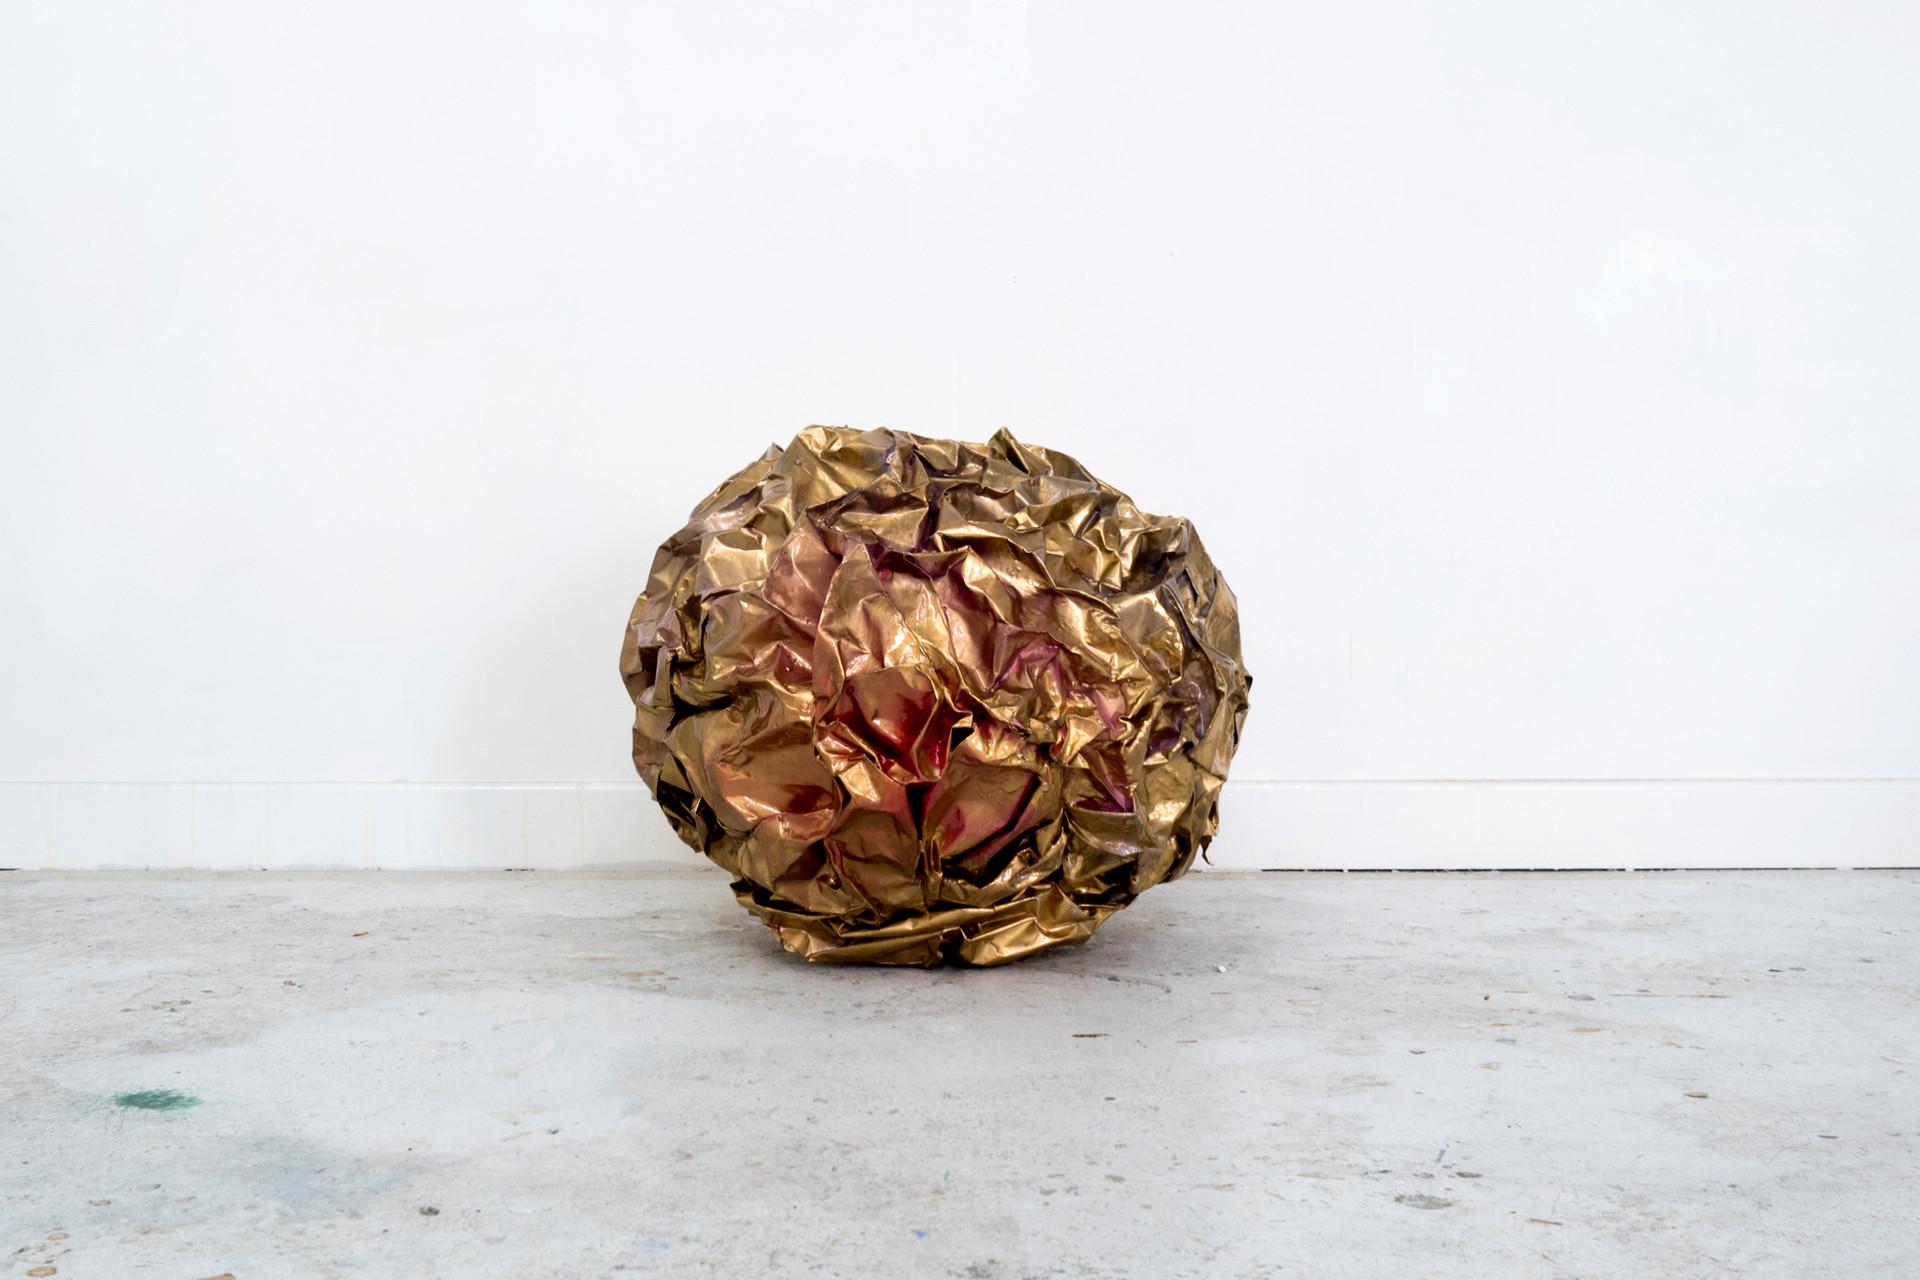 Golden nugget 2018